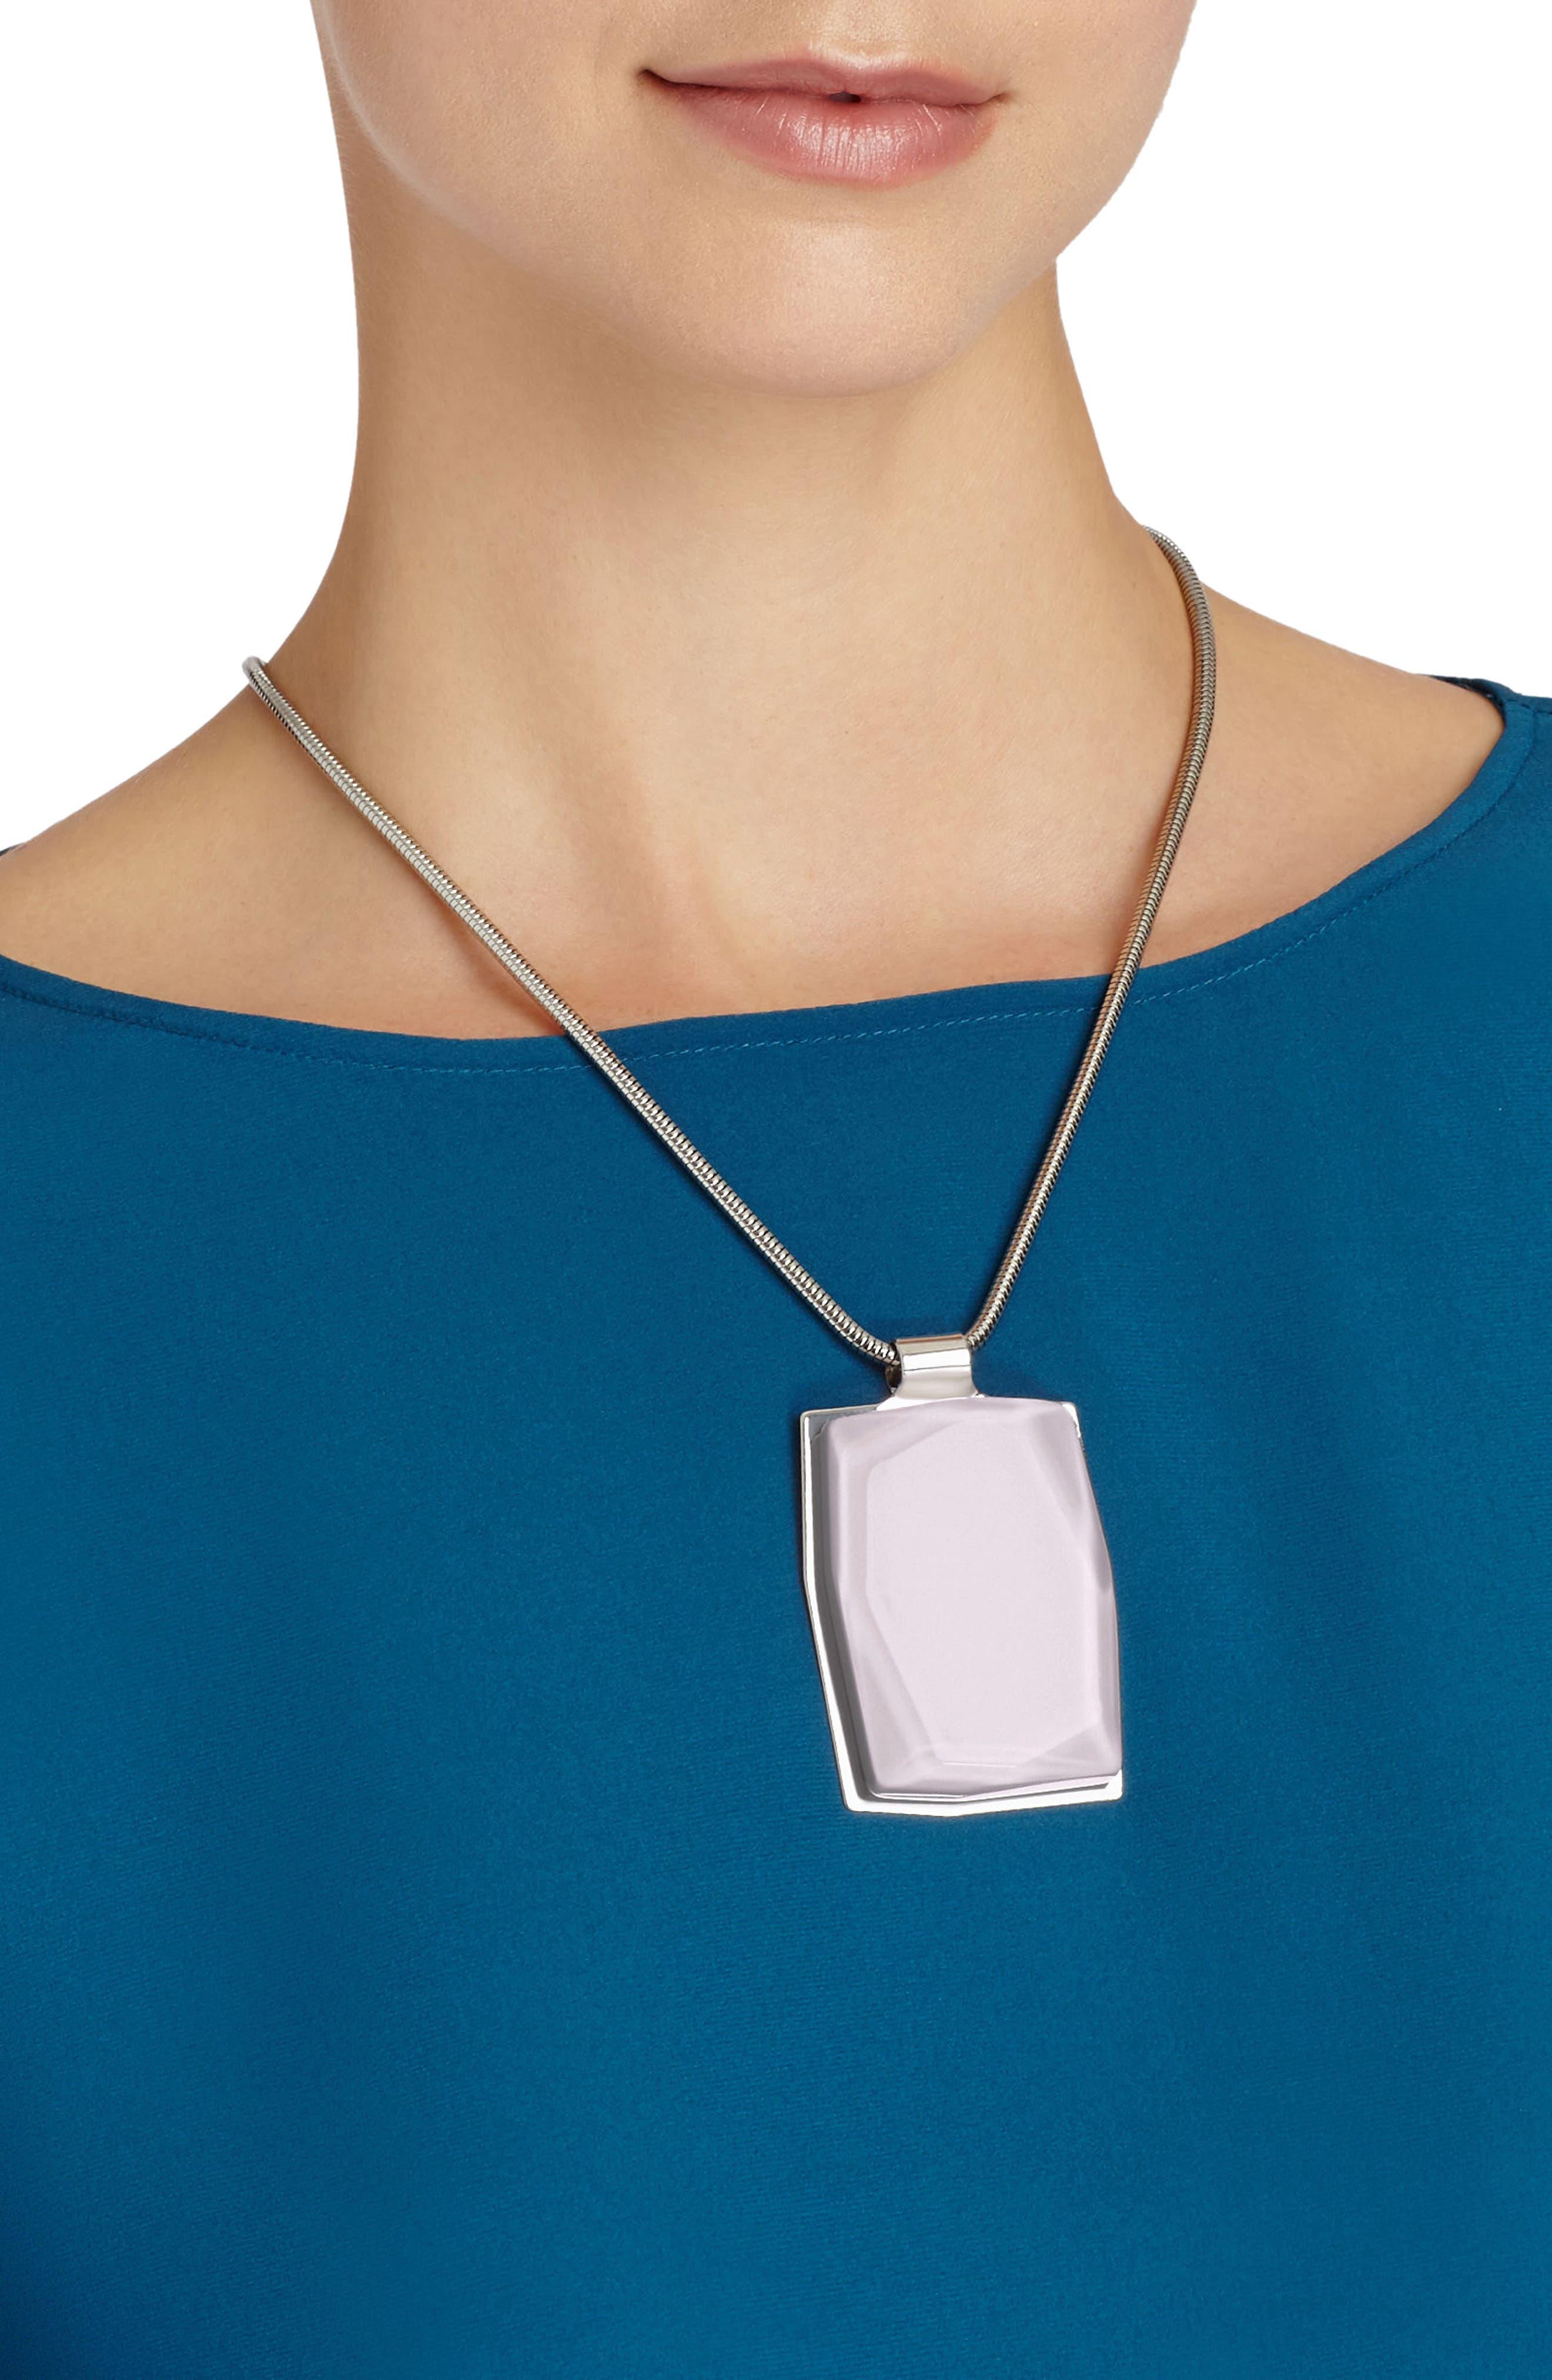 Faceted Pendant Drop Necklace,                             Main thumbnail 1, color,                             Iced Violet